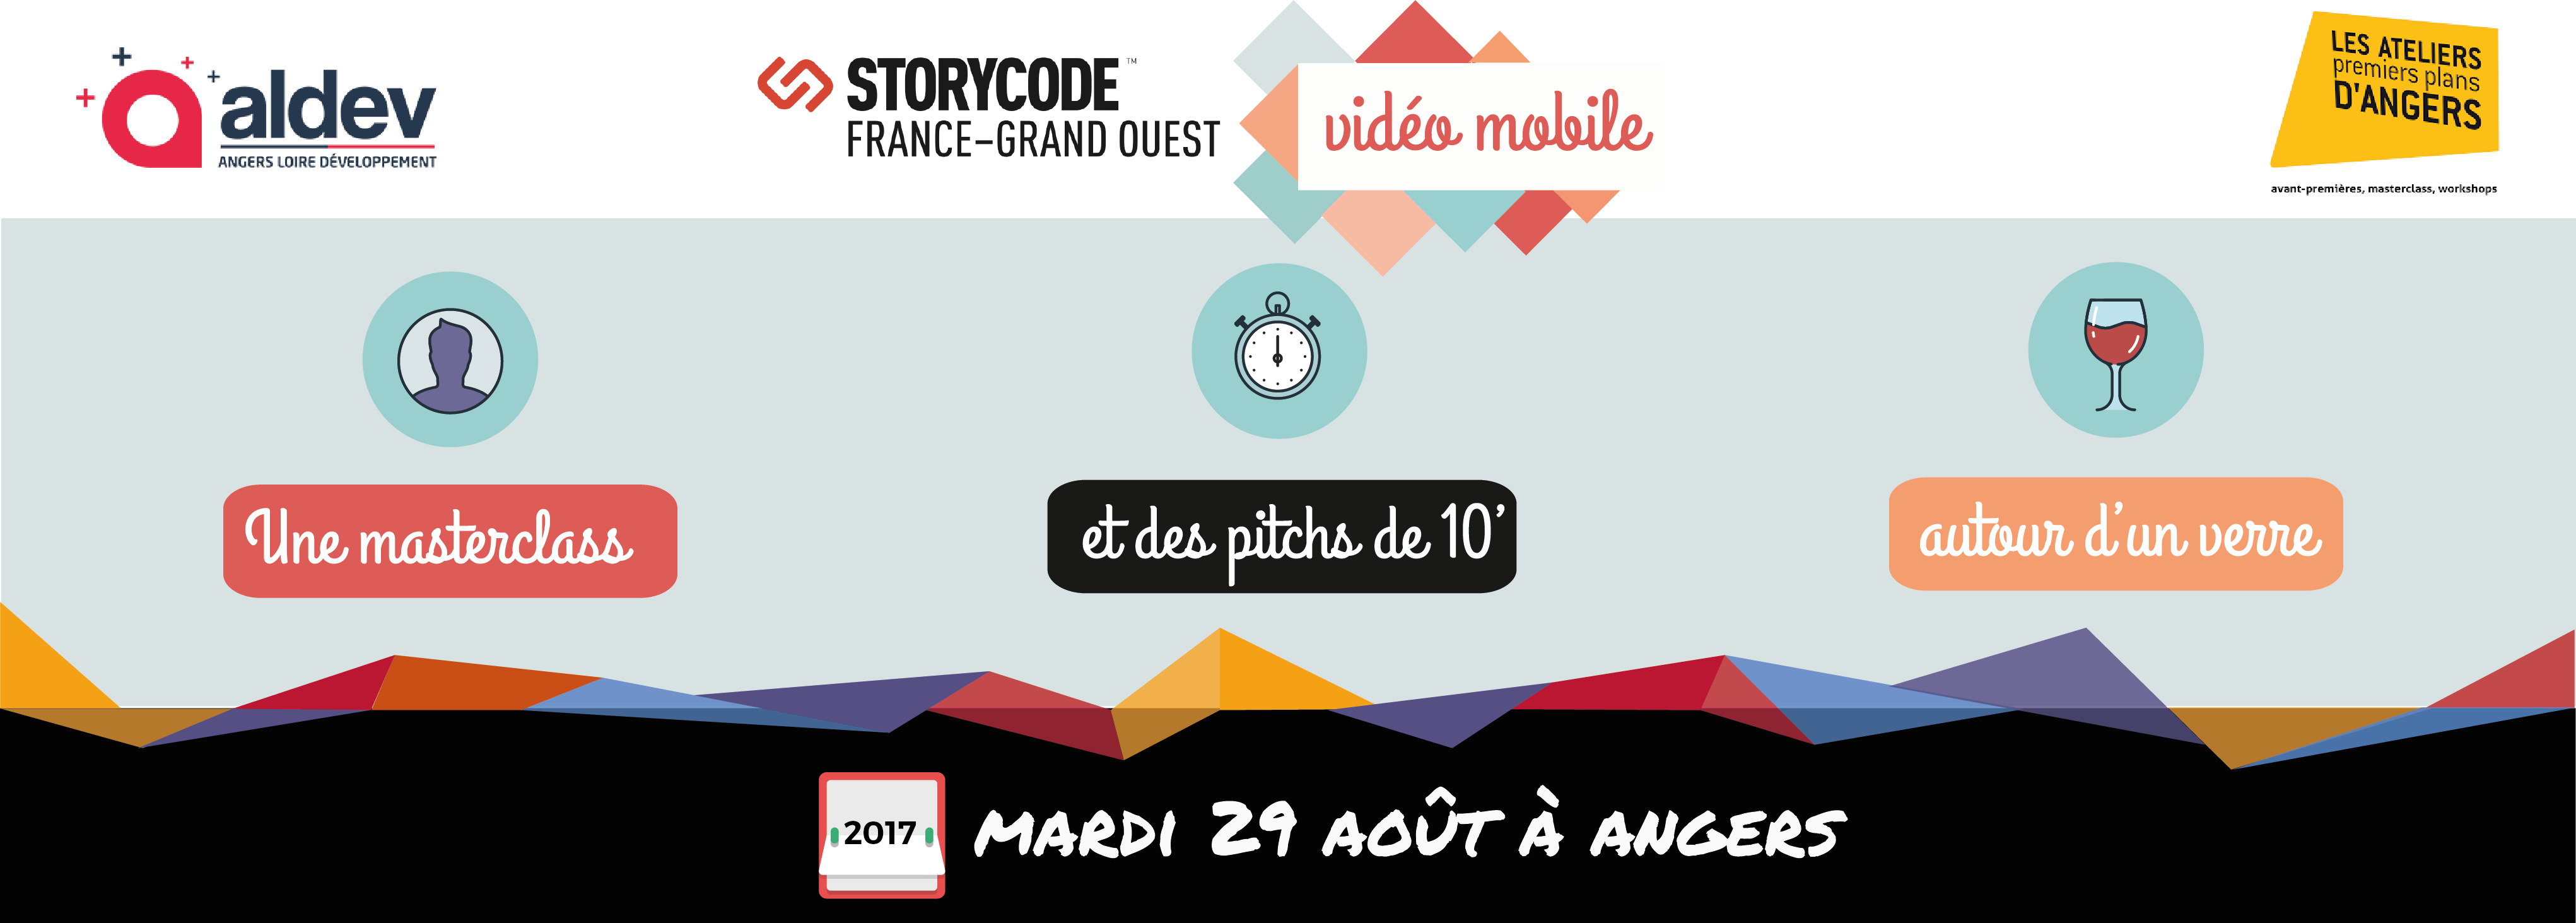 slider-storycode